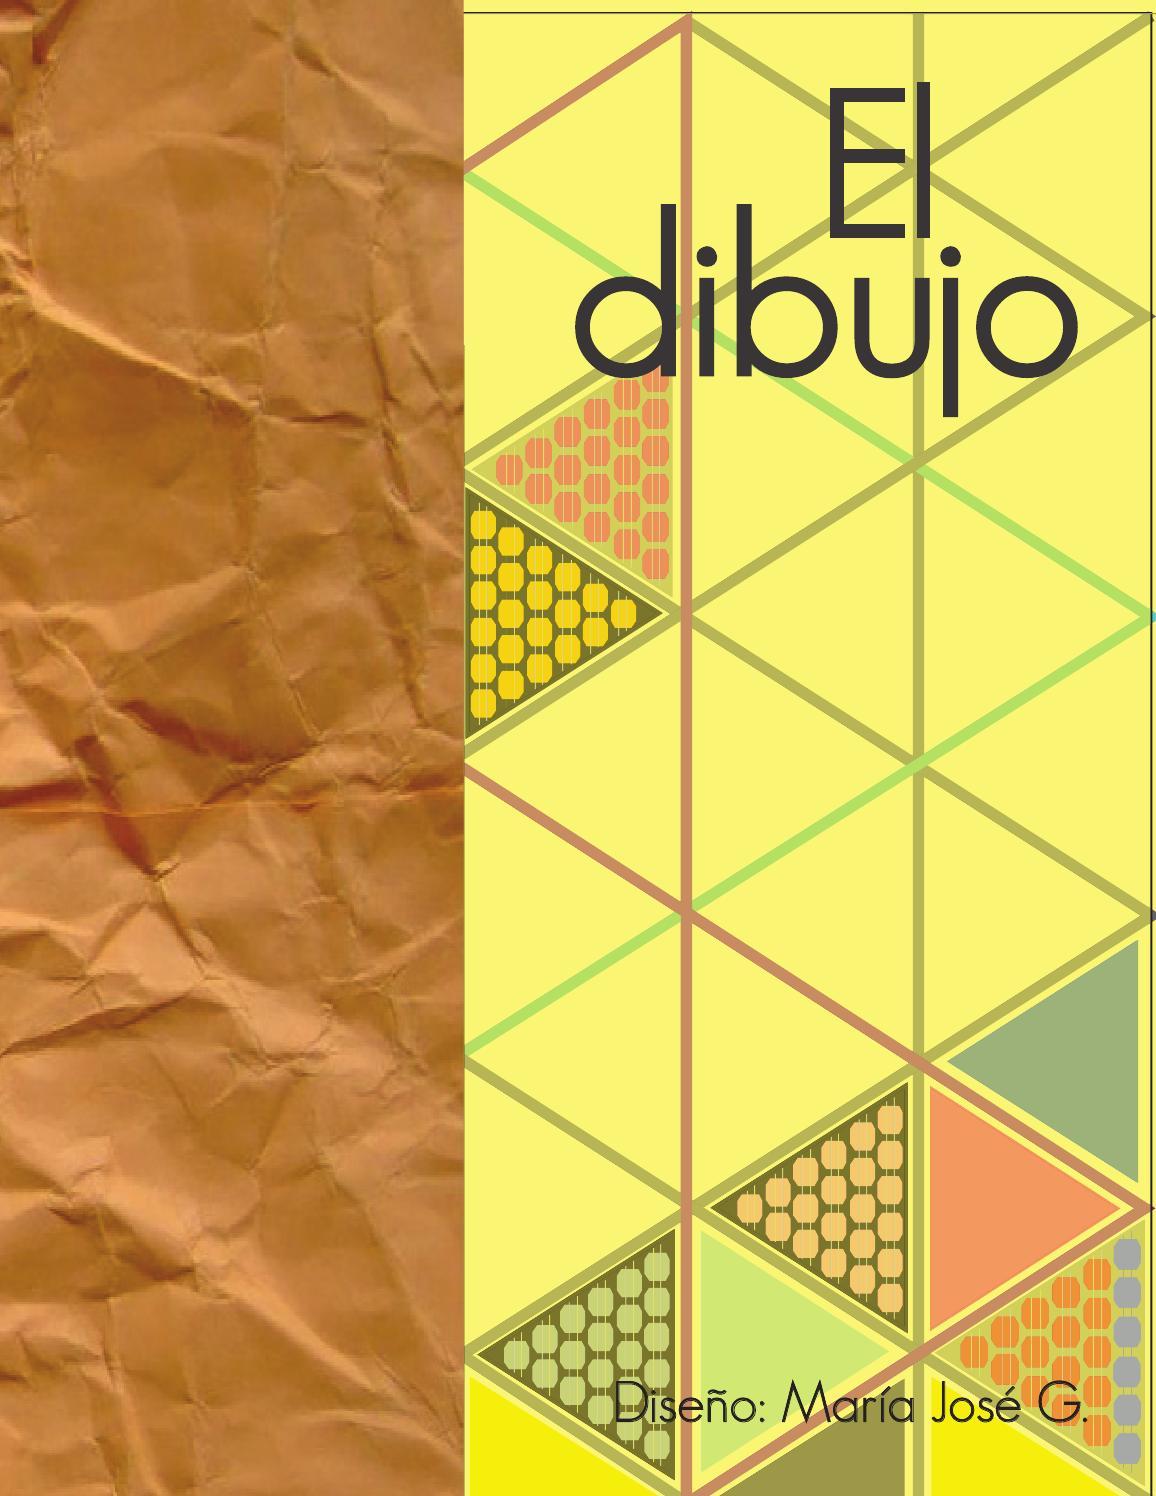 Isuu Didujo Tecnico - Magazine cover